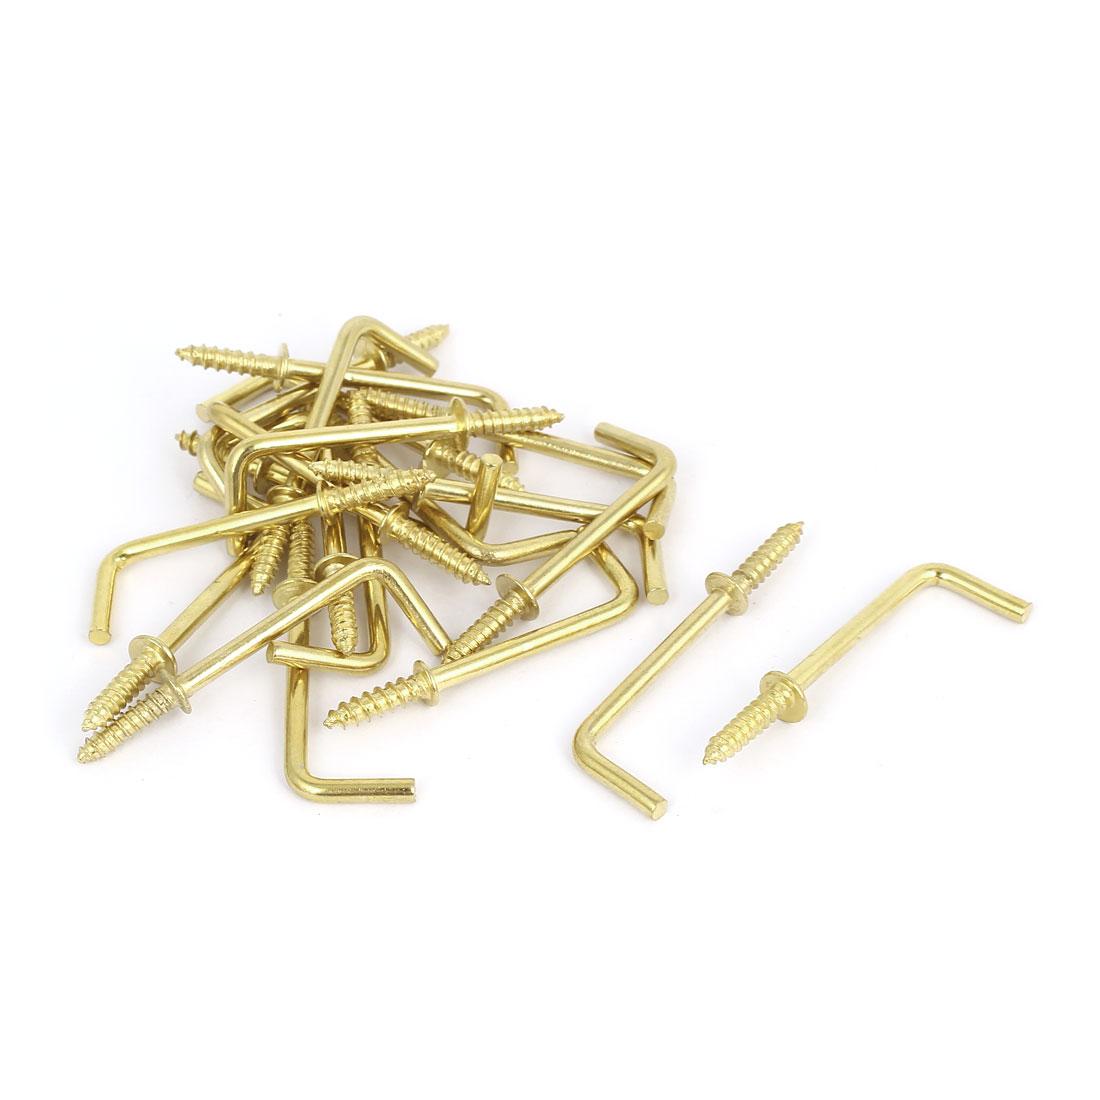 47mm x 16mm x 3mm L Shaped Shoulder Straight Dresser Cup Hook Hanger 20PCS